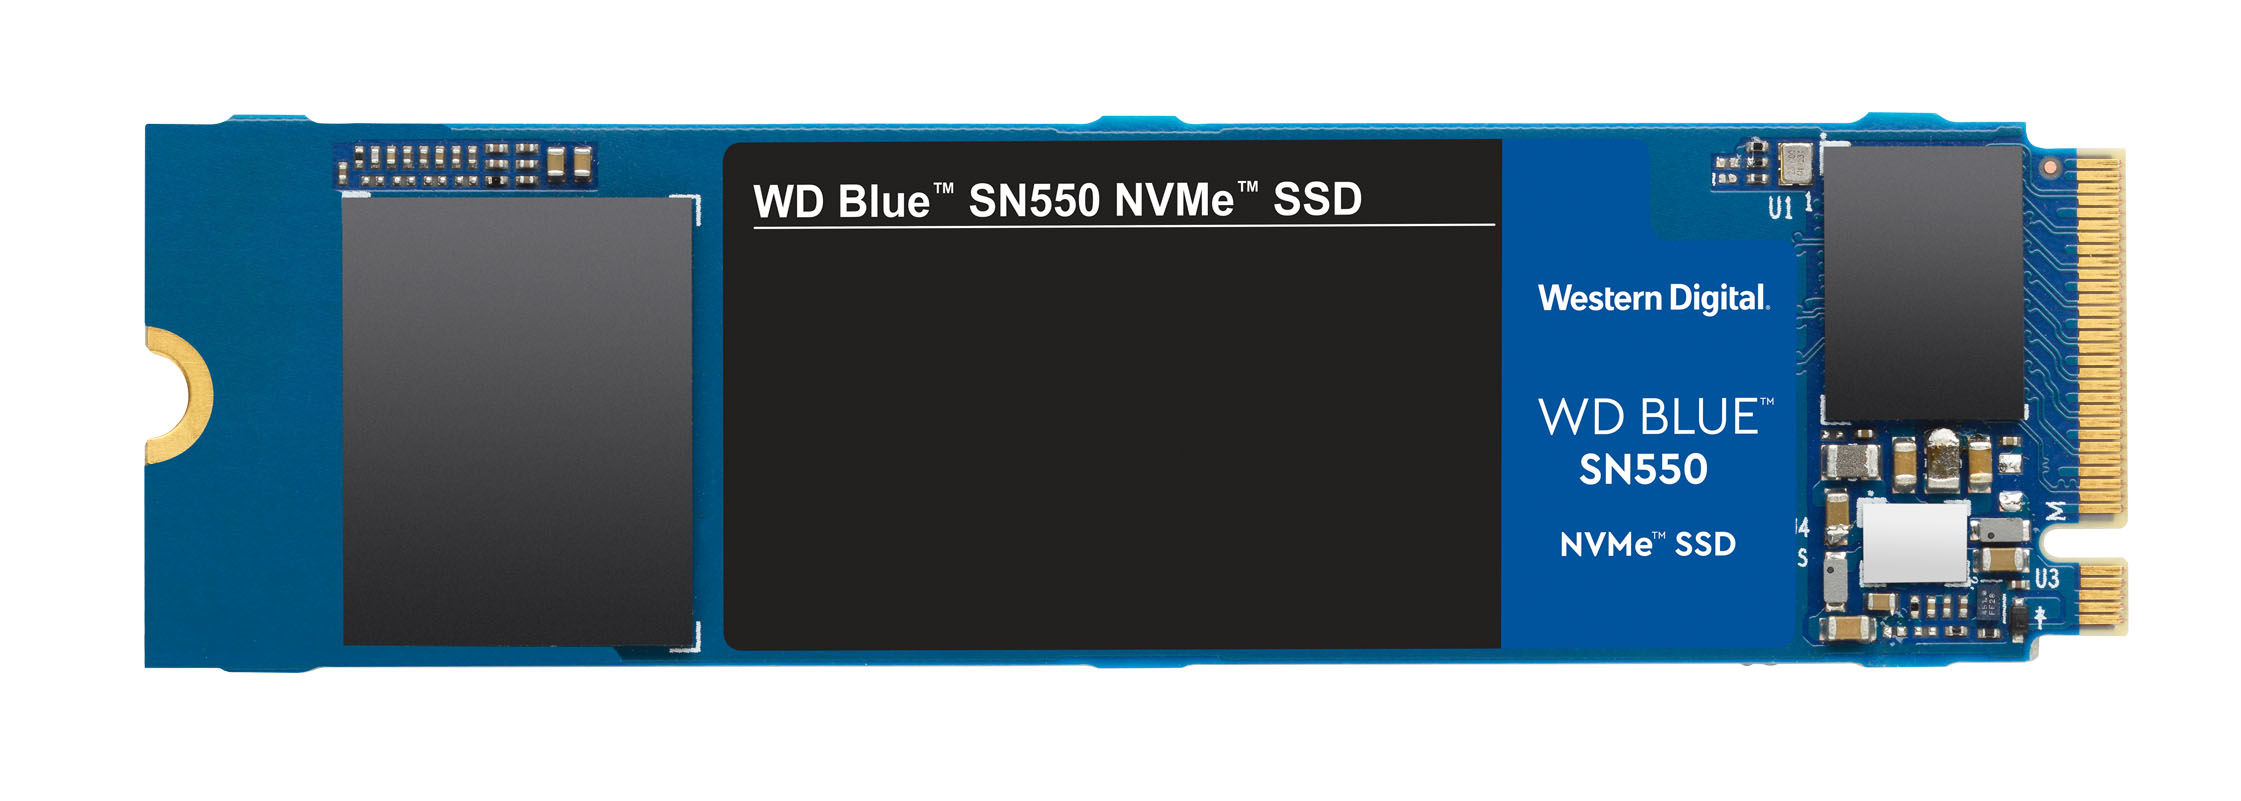 SSD NVMe WD Blue SN550 Western Digital